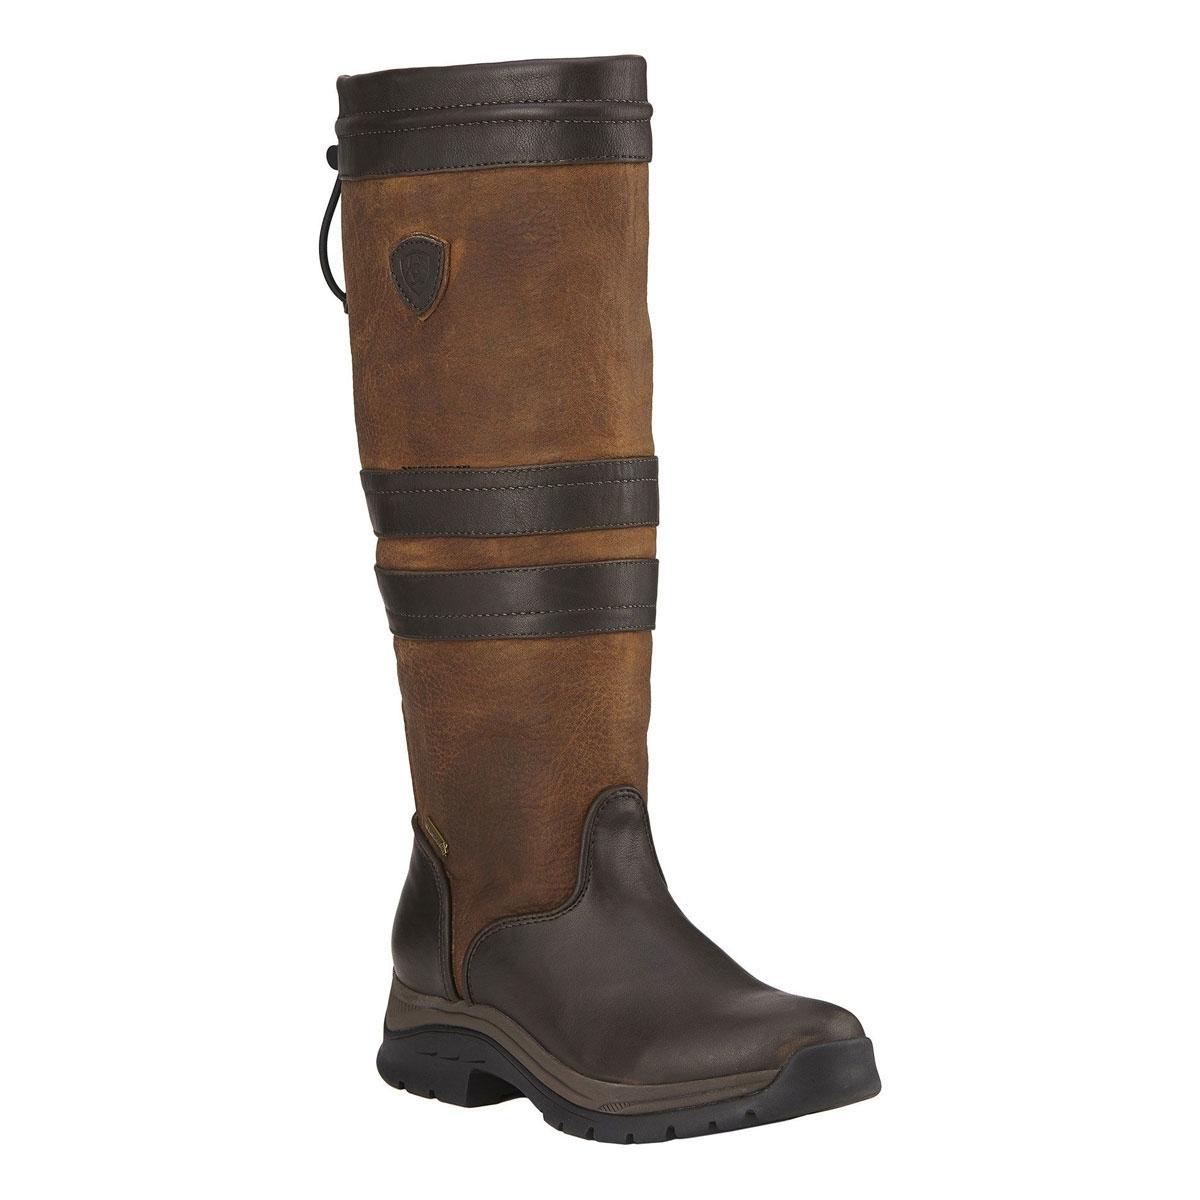 e44f954d9b5 Ariat Braemar GTX Country Boot (Women's) - Ebony Brown